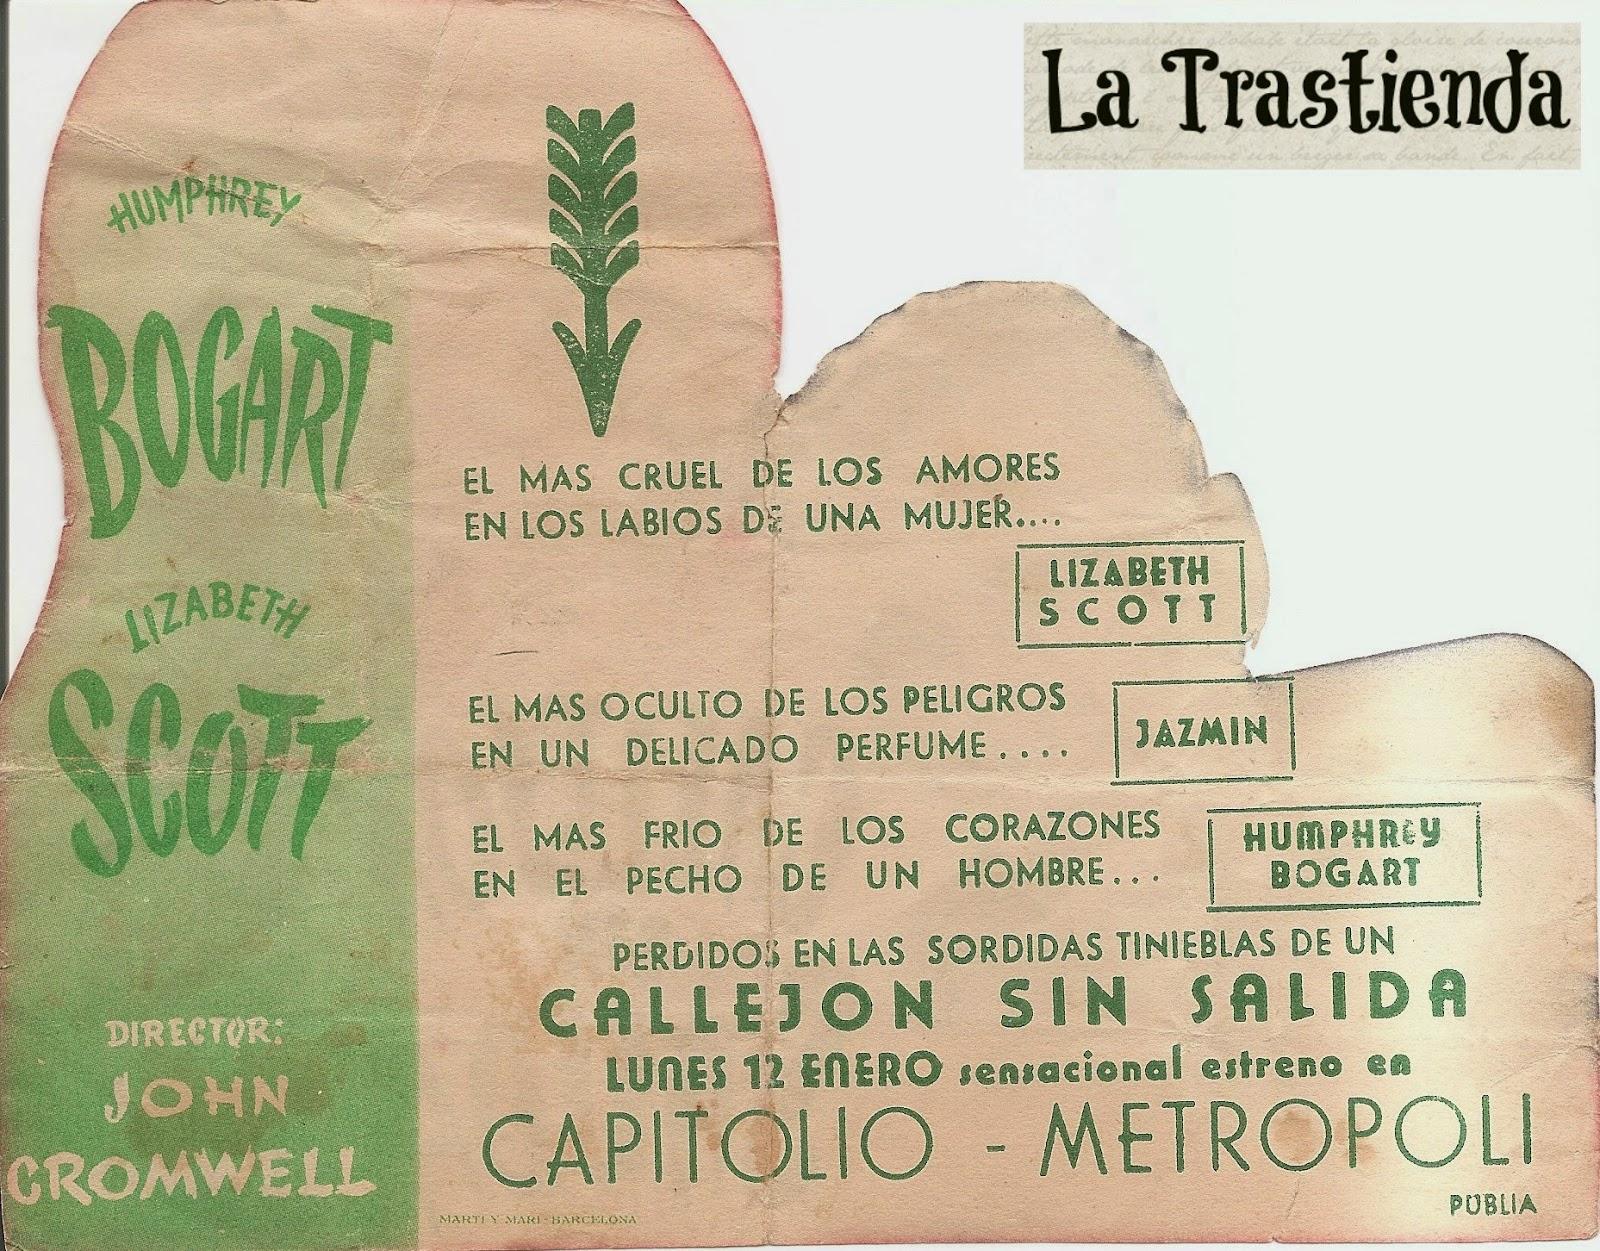 Programa de Cine - Callejón Sin Salida - Humphrey Bogart - Lizabeth Scott